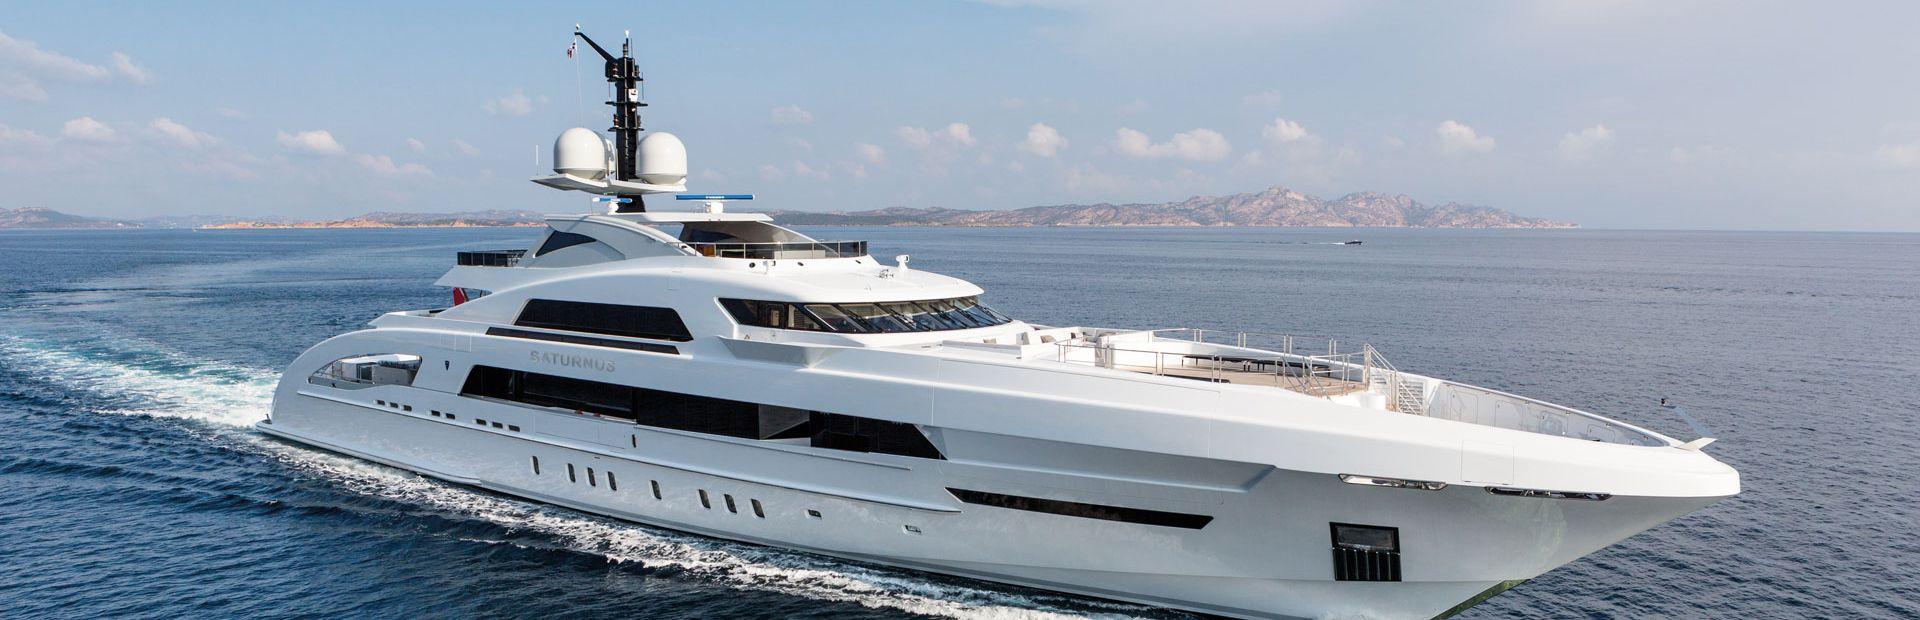 6500 Aluminium Yacht Charter